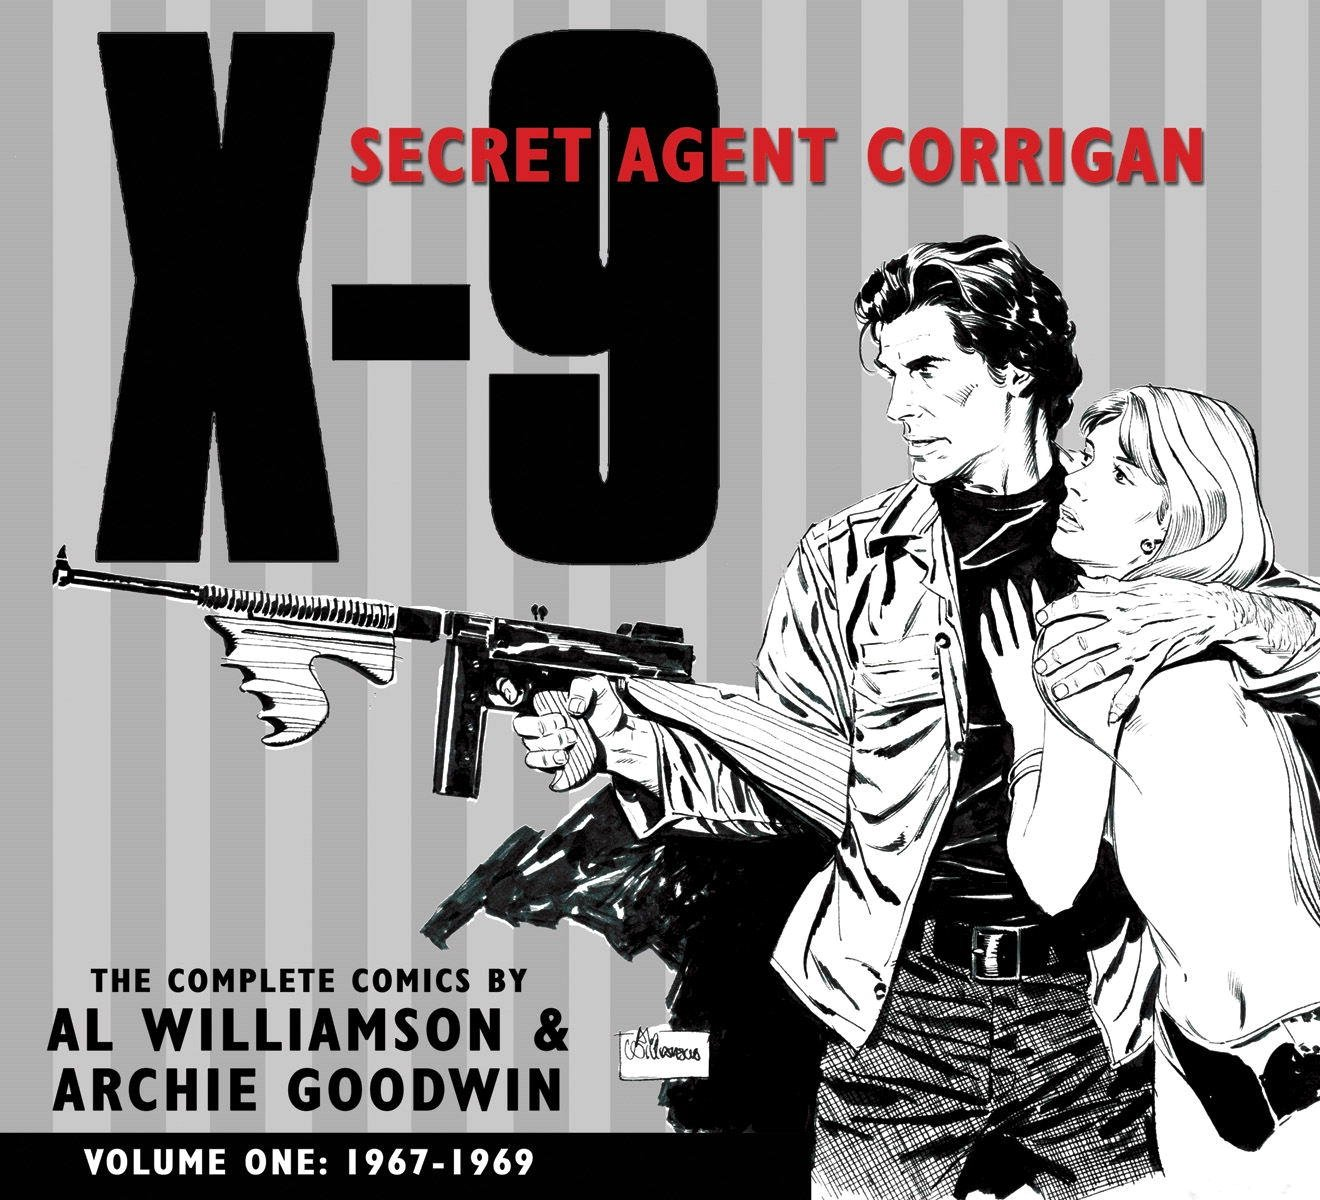 Download X-9: Secret Agent Corrigan Volume 1 ebook